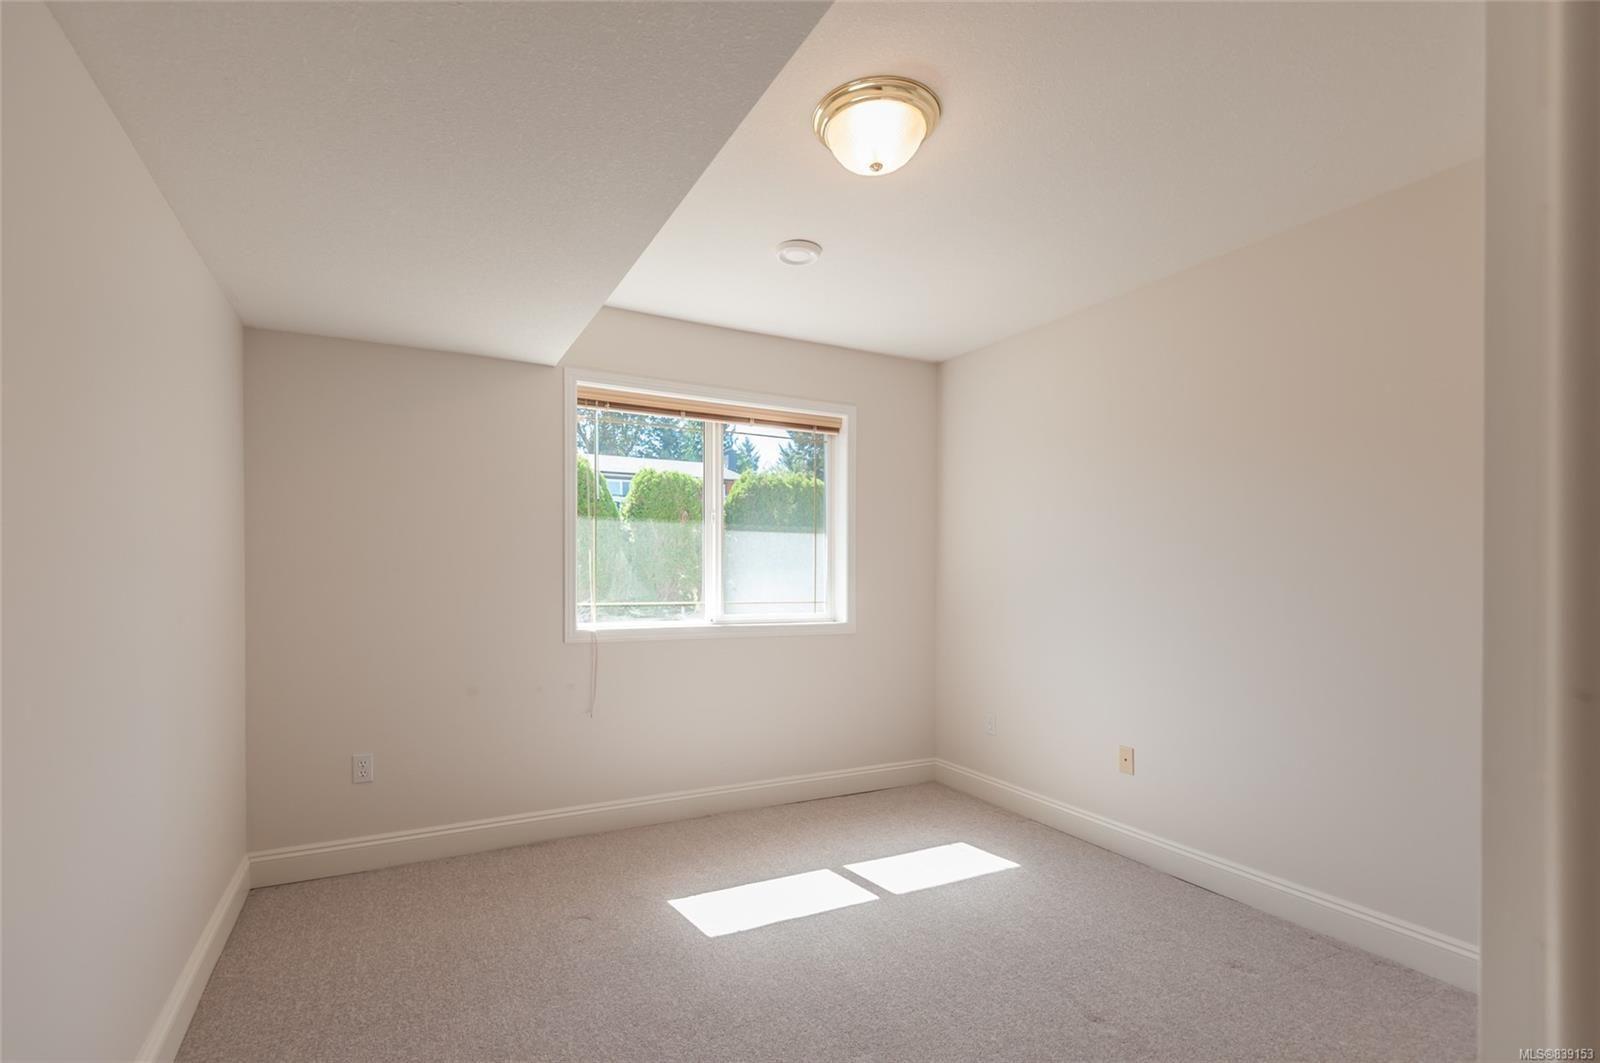 Photo 41: Photos: 6412 Dover Rd in NANAIMO: Na North Nanaimo House for sale (Nanaimo)  : MLS®# 839153